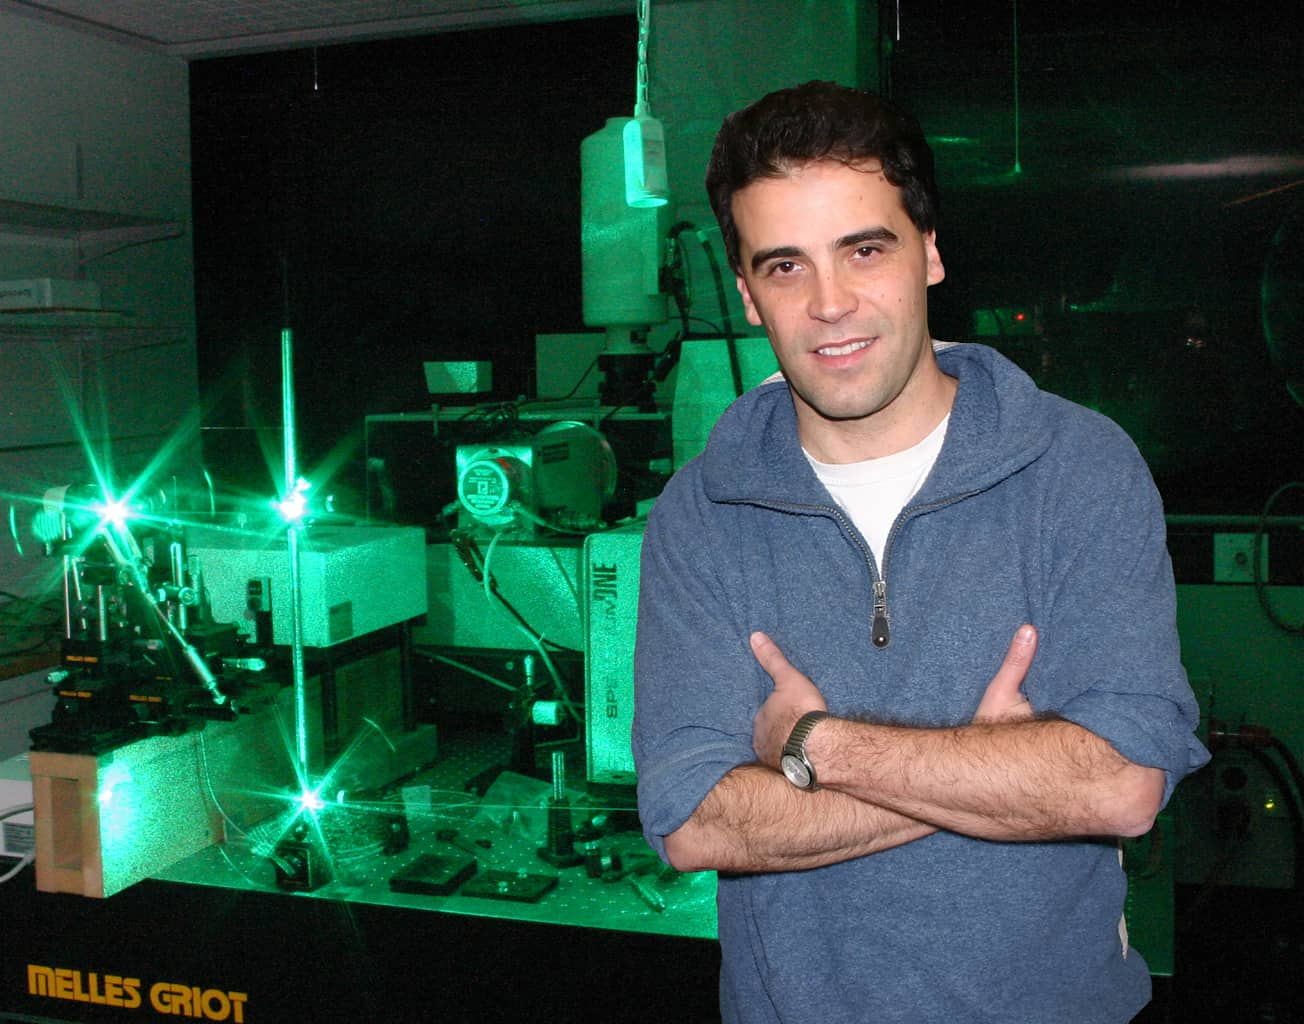 Professor Pablo Etchegoin 1964-2013